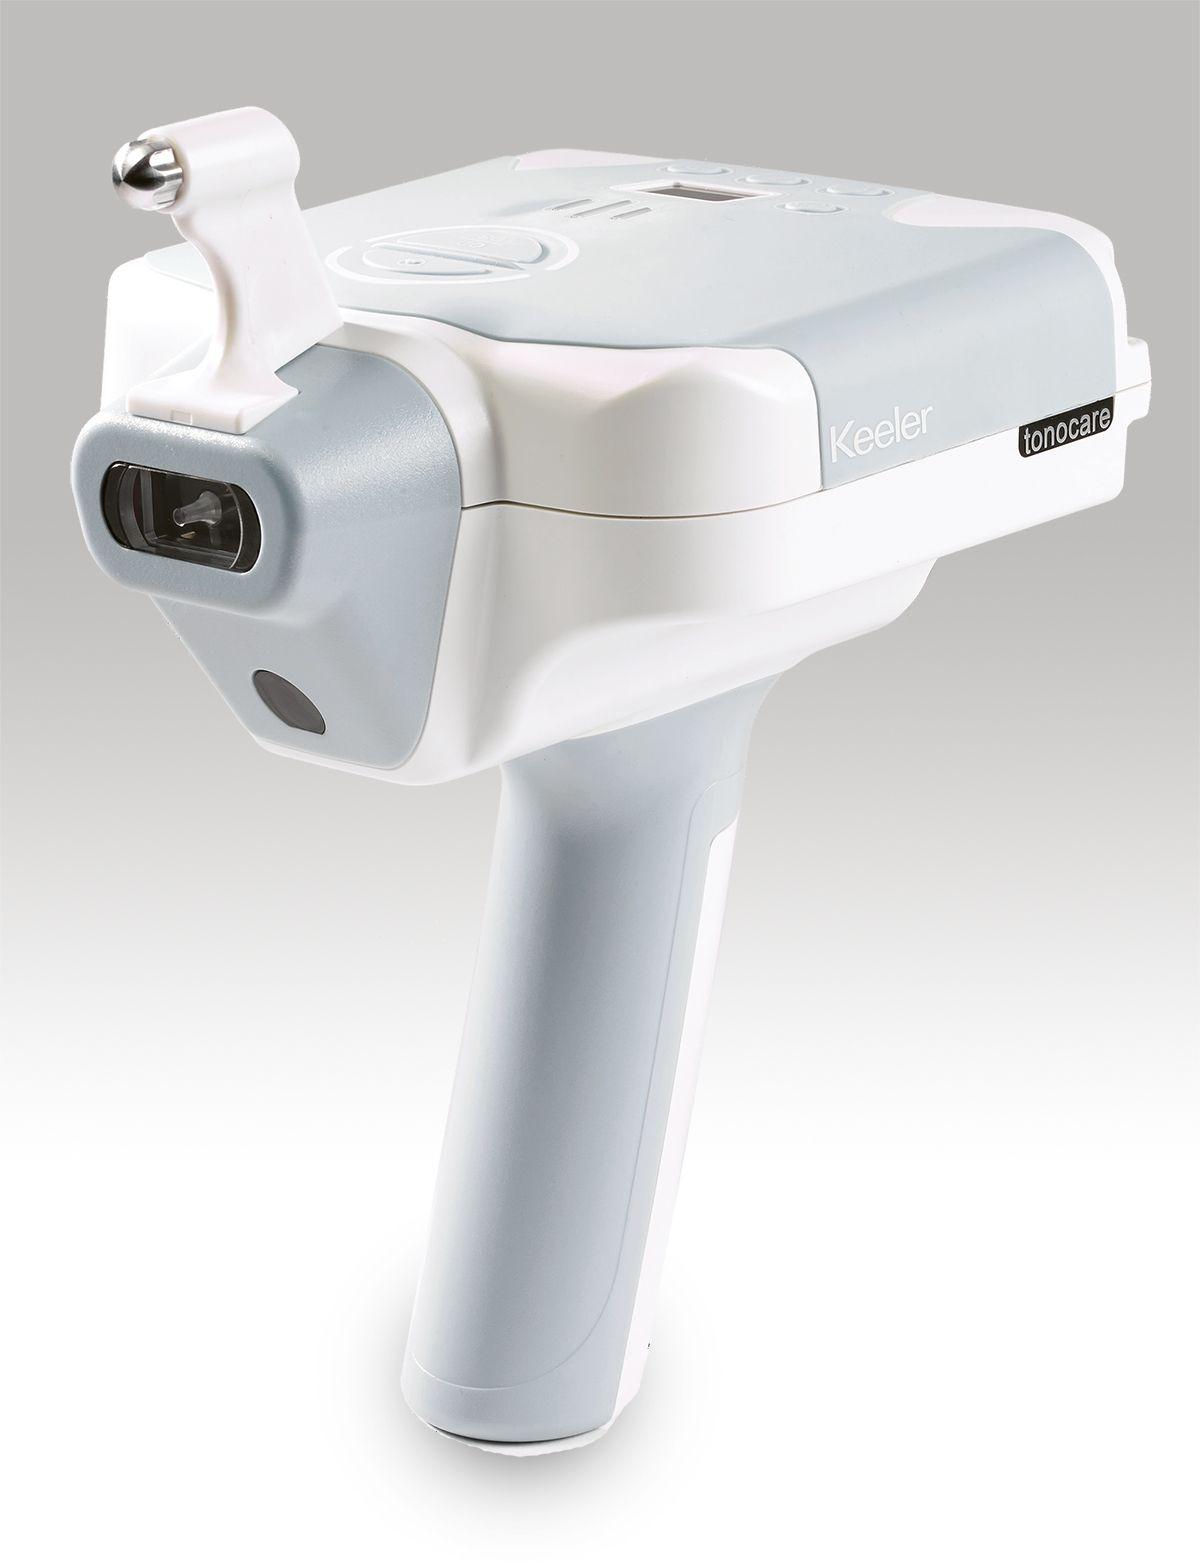 tonocare-3 - BiB Ophthalmic Instruments | BiB Ophthalmic